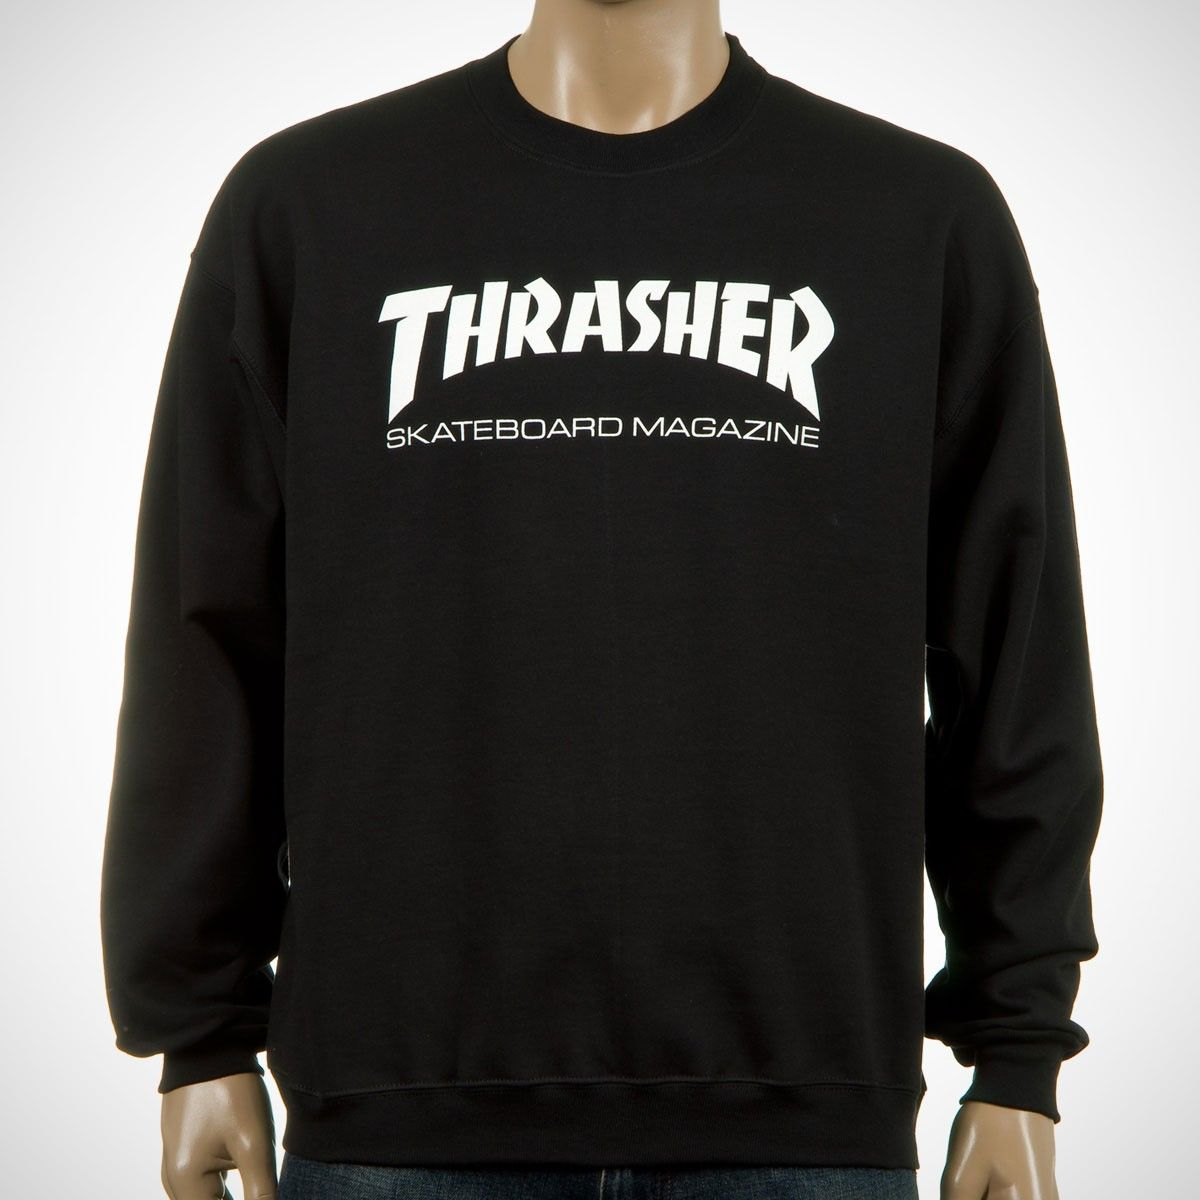 Thrasher Skate Mag Logo Crew Sweat Black Thrasher Thrasher Skate Fall Outfits [ 1200 x 1200 Pixel ]